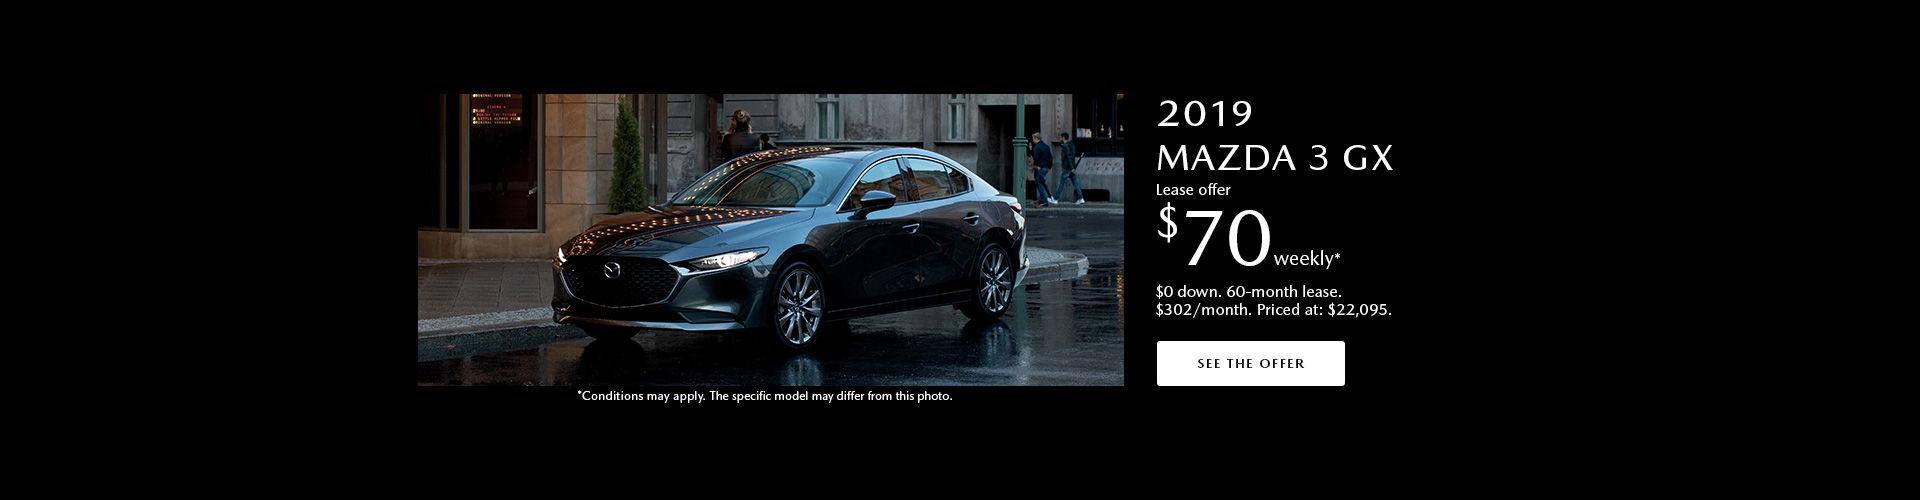 Mazda 3 incentive June